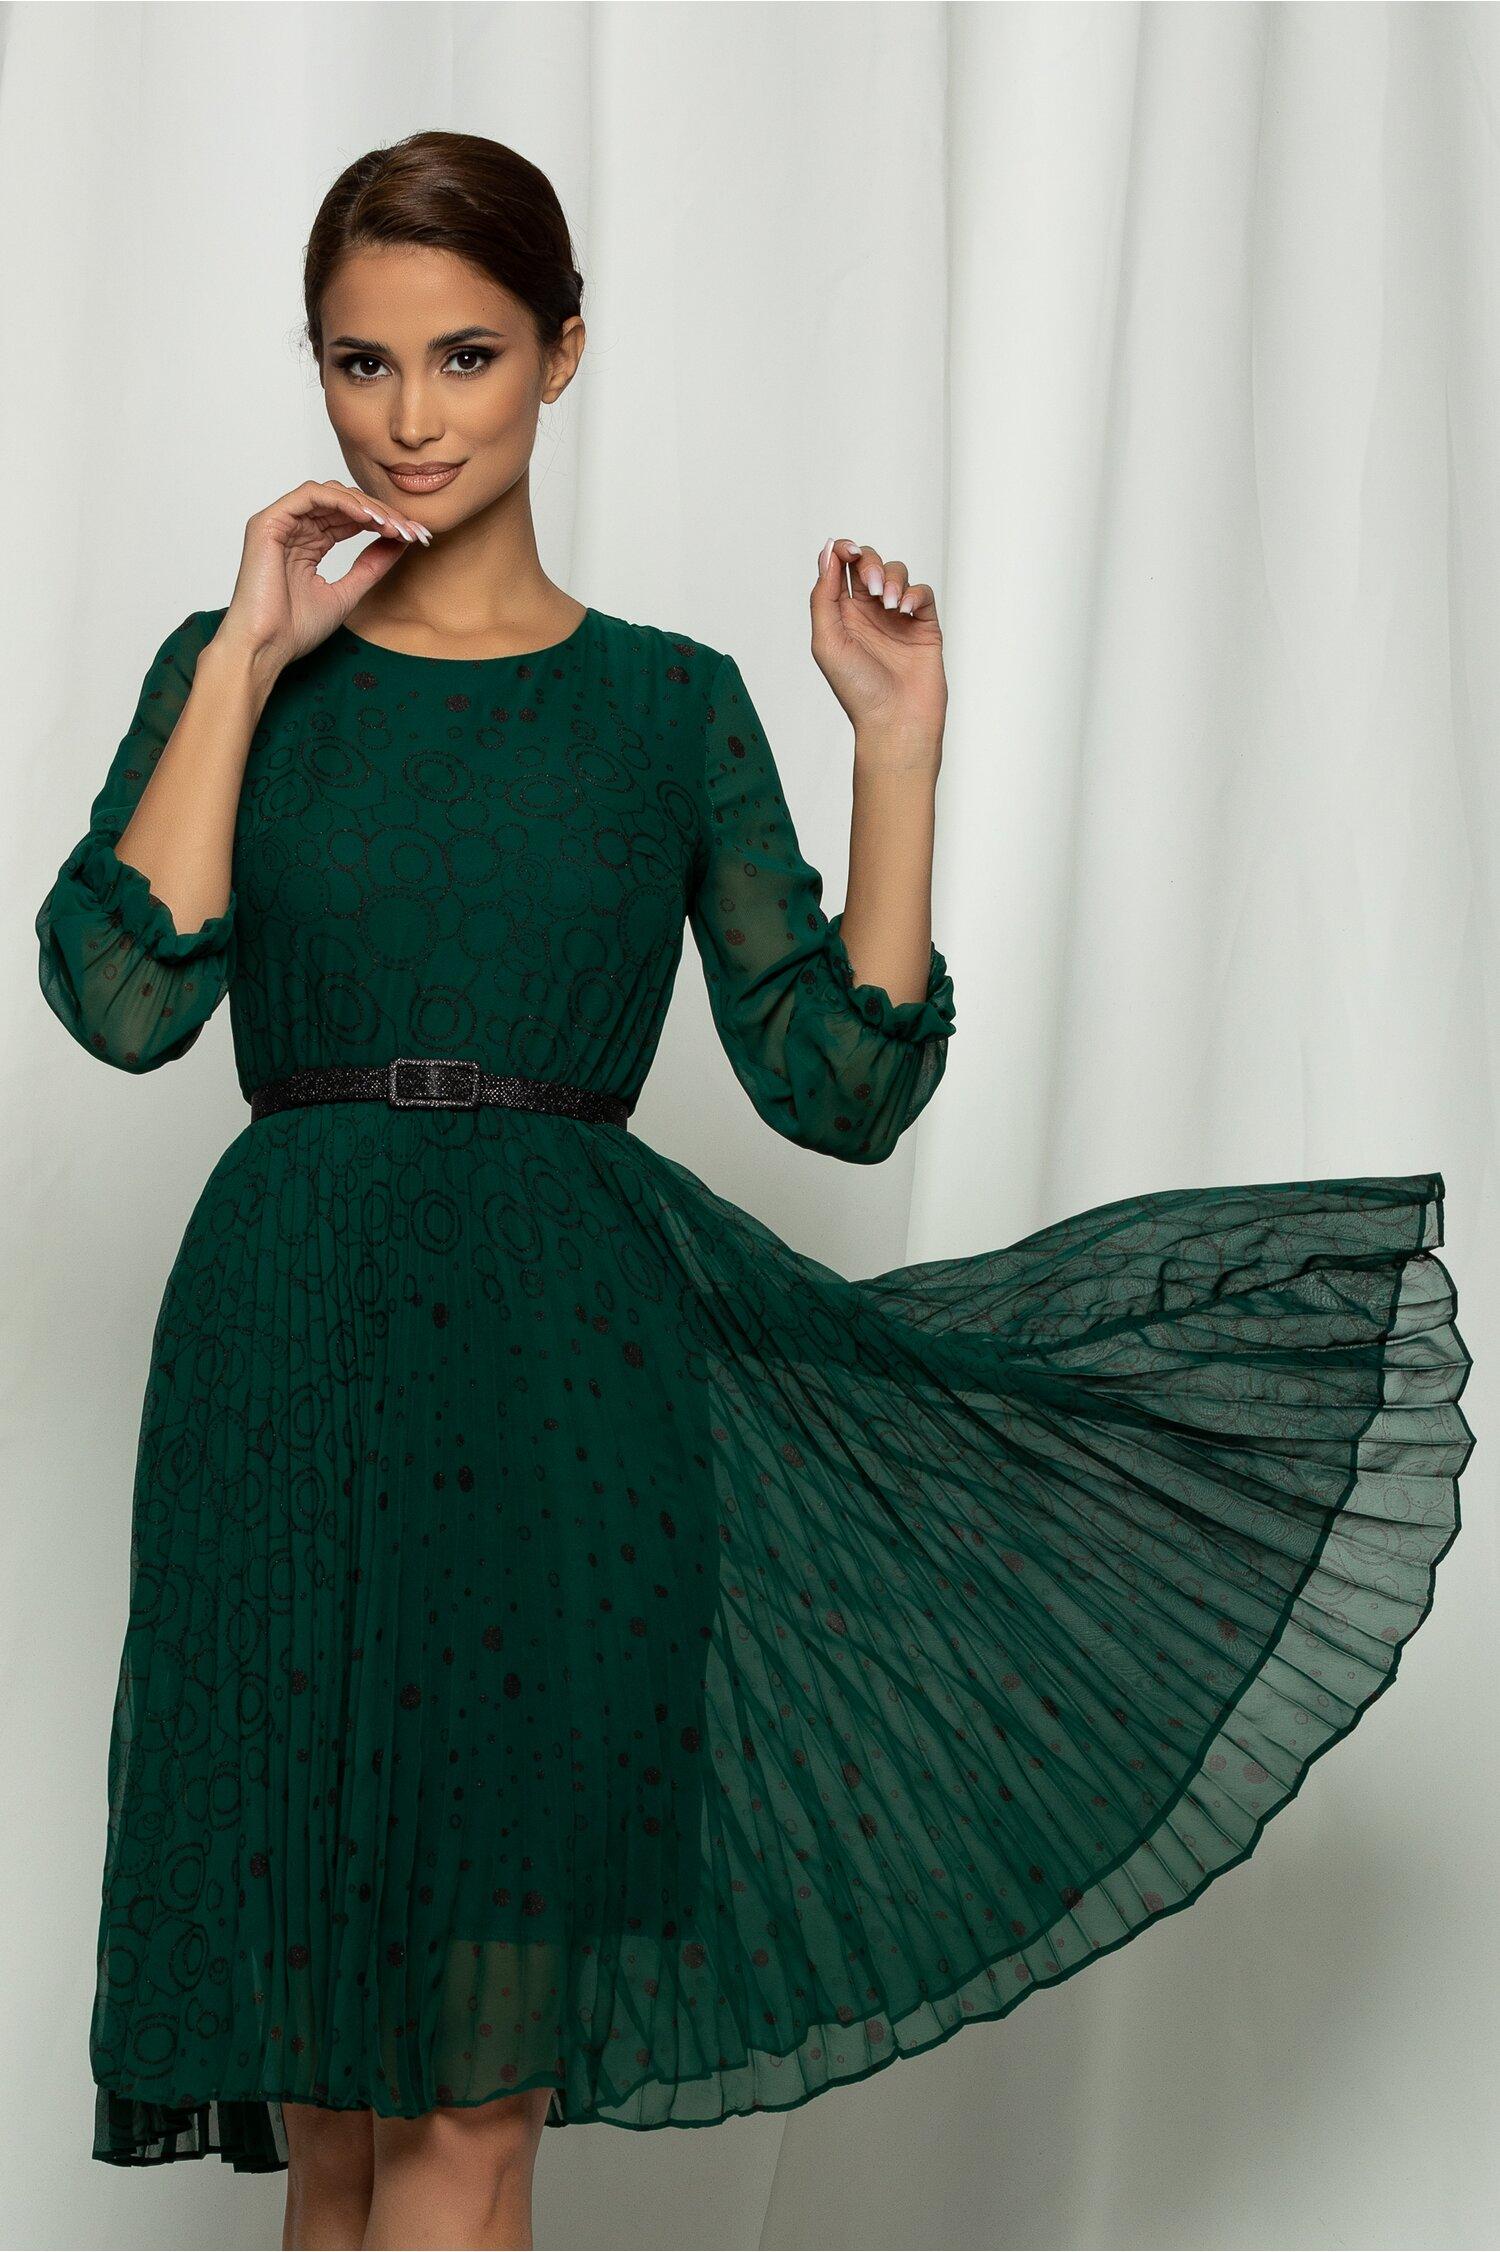 Rochie Ana verde plisata si design cu cerculete